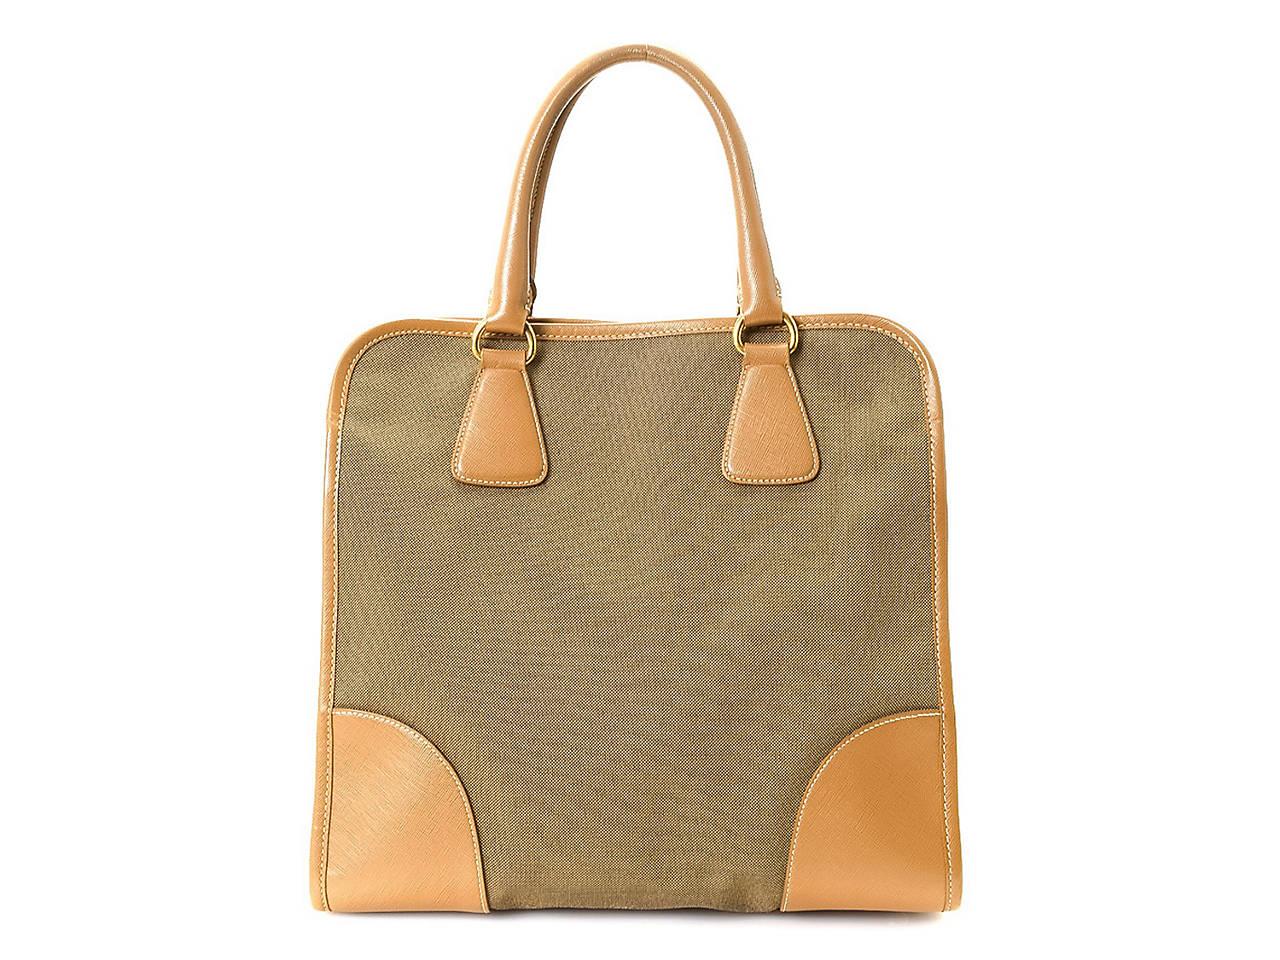 2271f5886c86 Prada - Vintage Luxury Jacquard Two Way Tote Women's Handbags ...